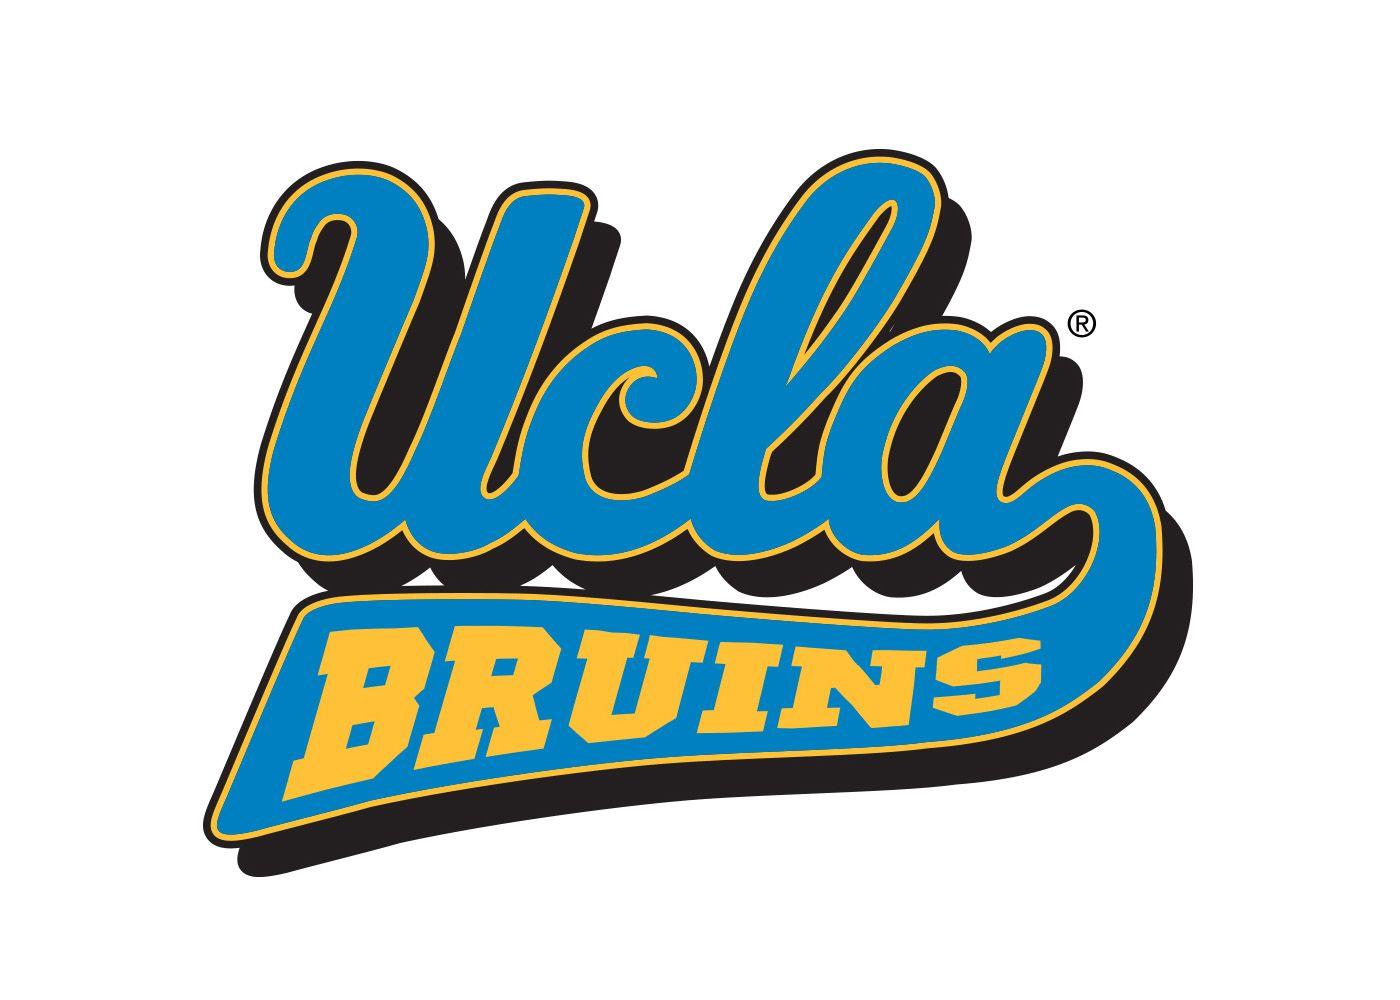 Color Ucla Logo Ucla Bruins Ucla Bruins Logo Ucla Bruins Football